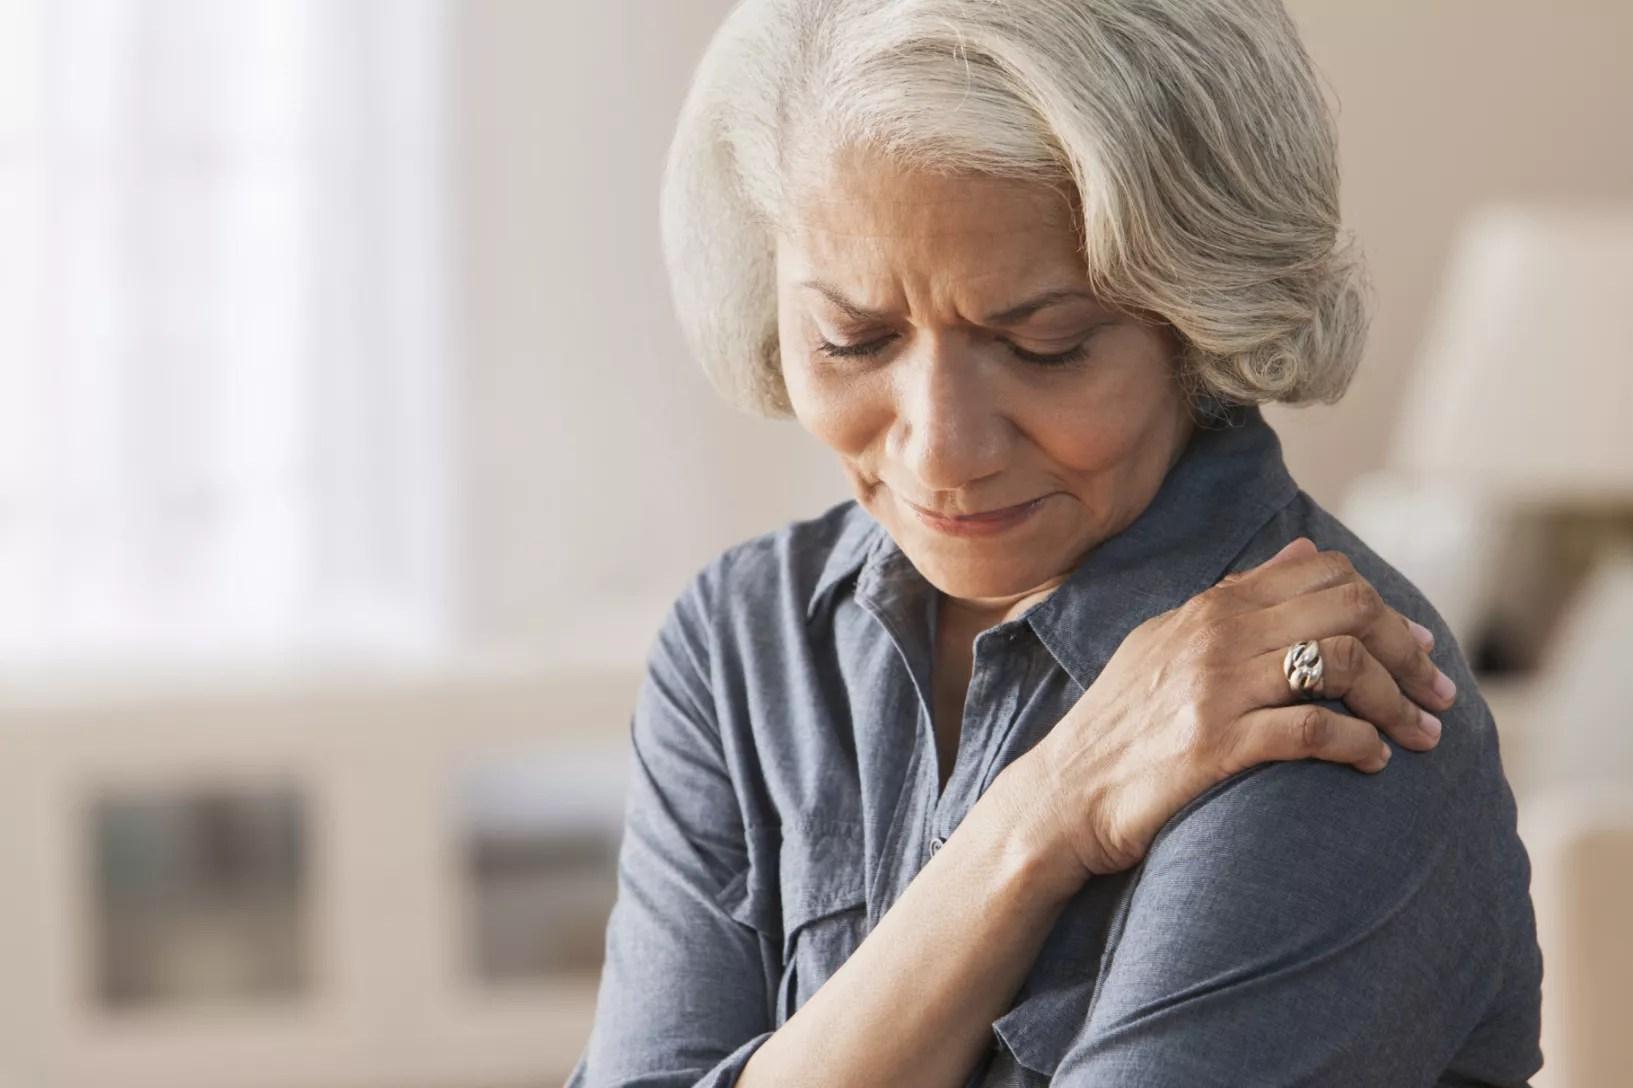 Woman rubbing shoulder in pain